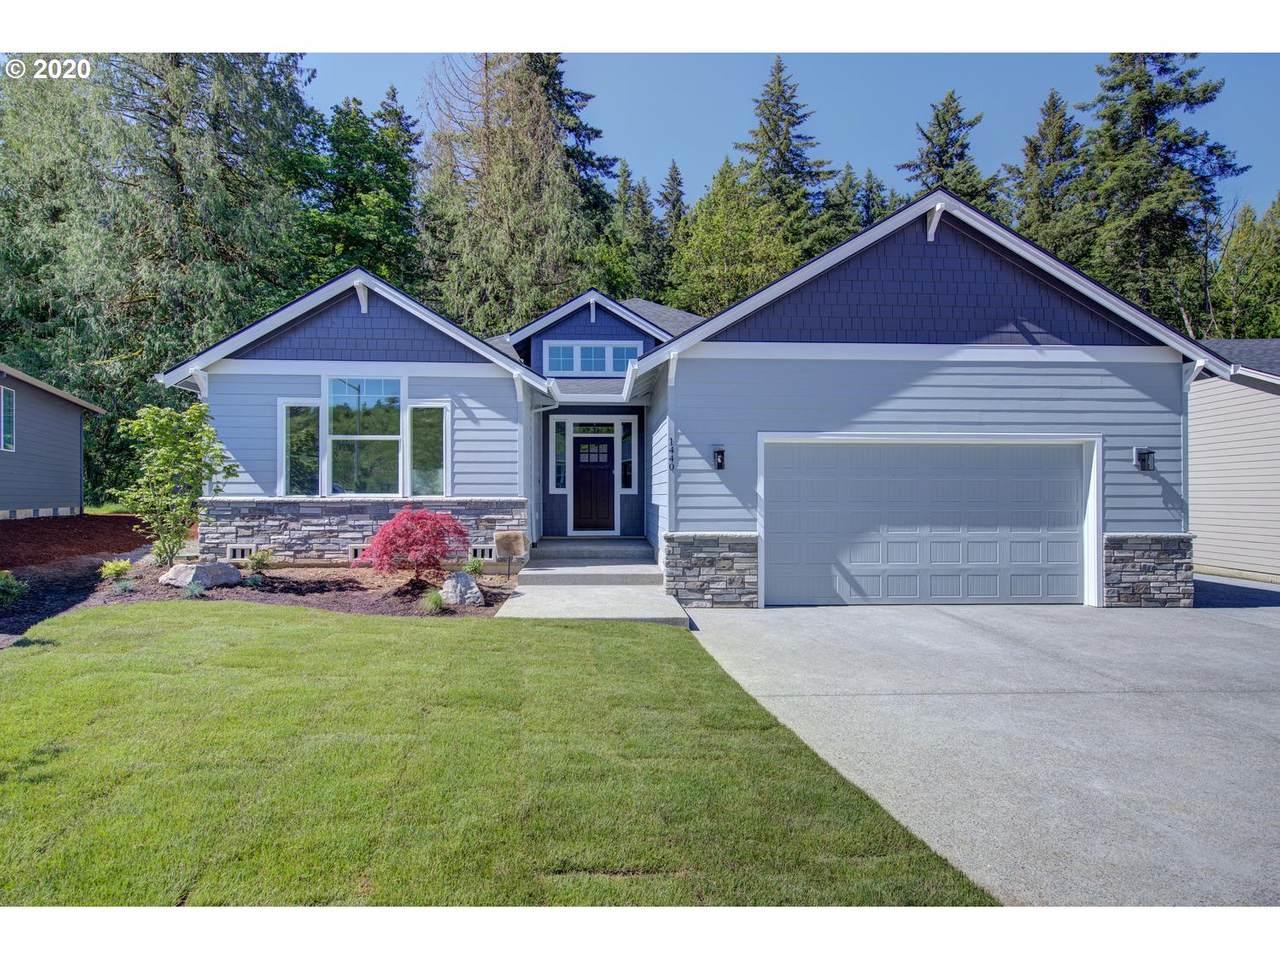 1480 Cascadia Ridge Dr - Photo 1